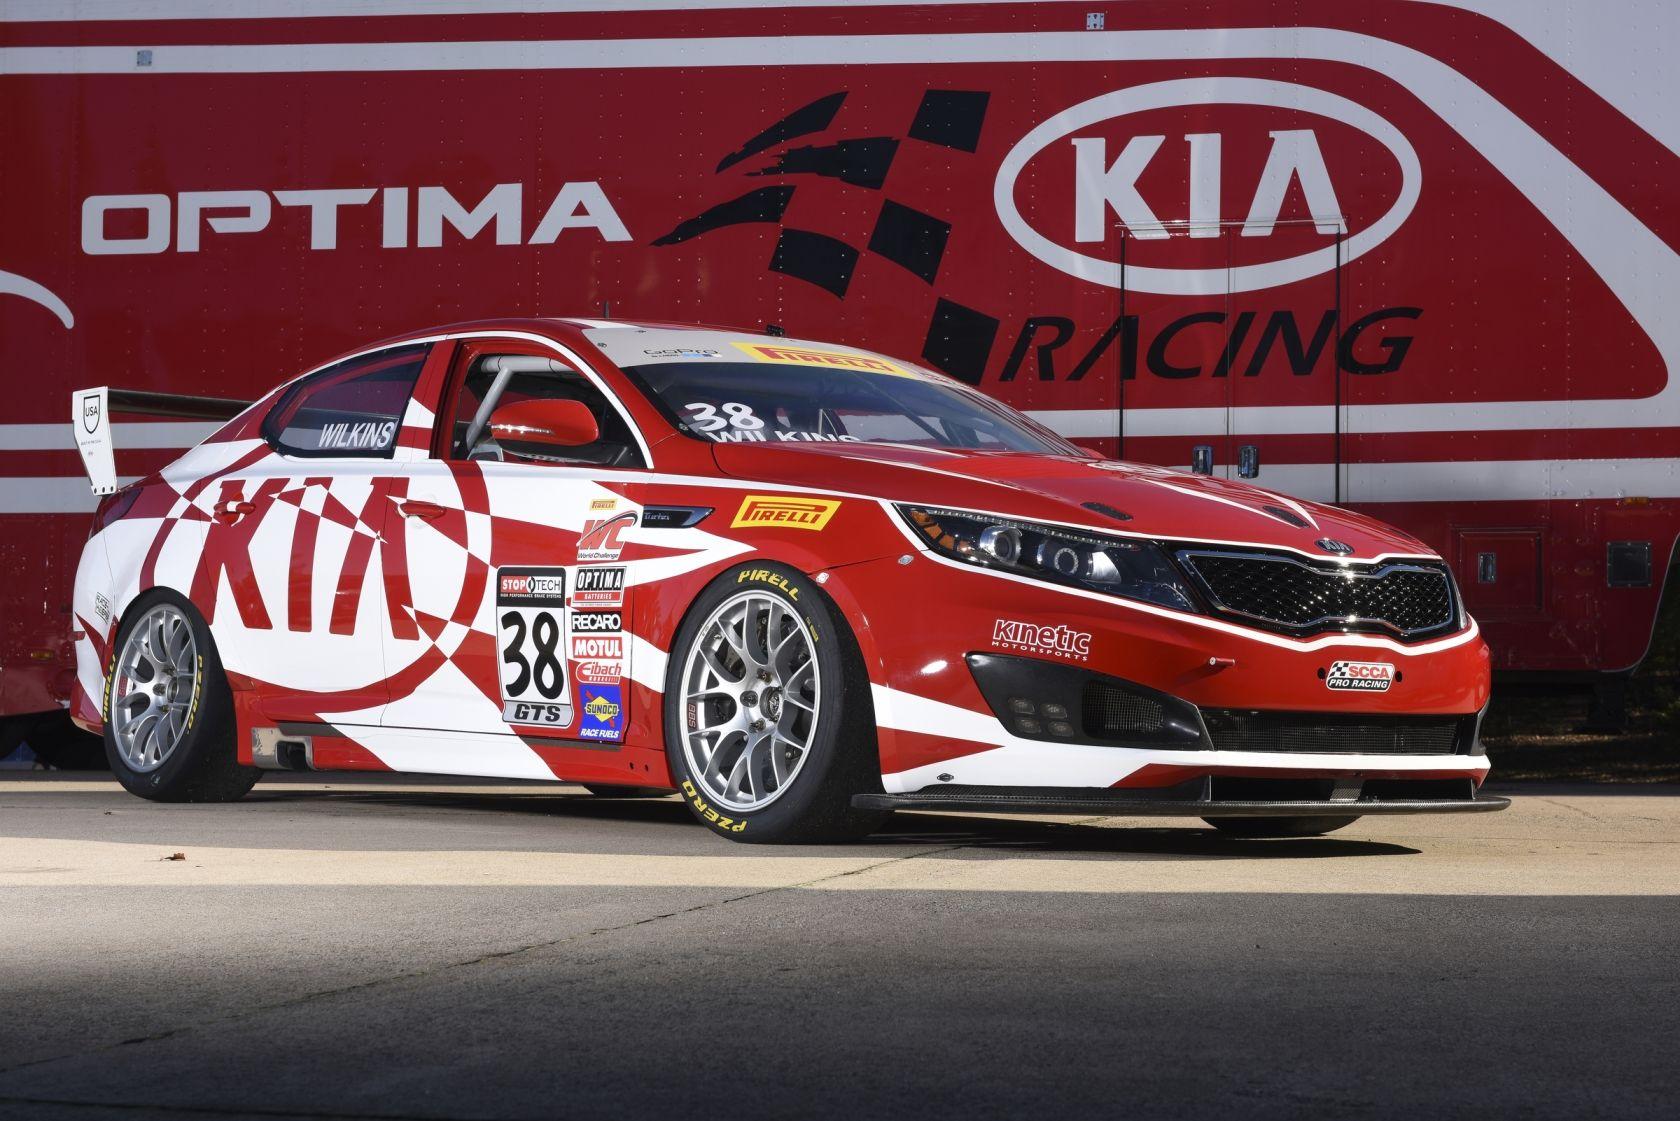 Kia Racing Optima Unveils New Paint Scheme Motorsport Kiaoptima Kiapotimaracing Pirelliworldchallenge Carsgm Racegm Raceglobal